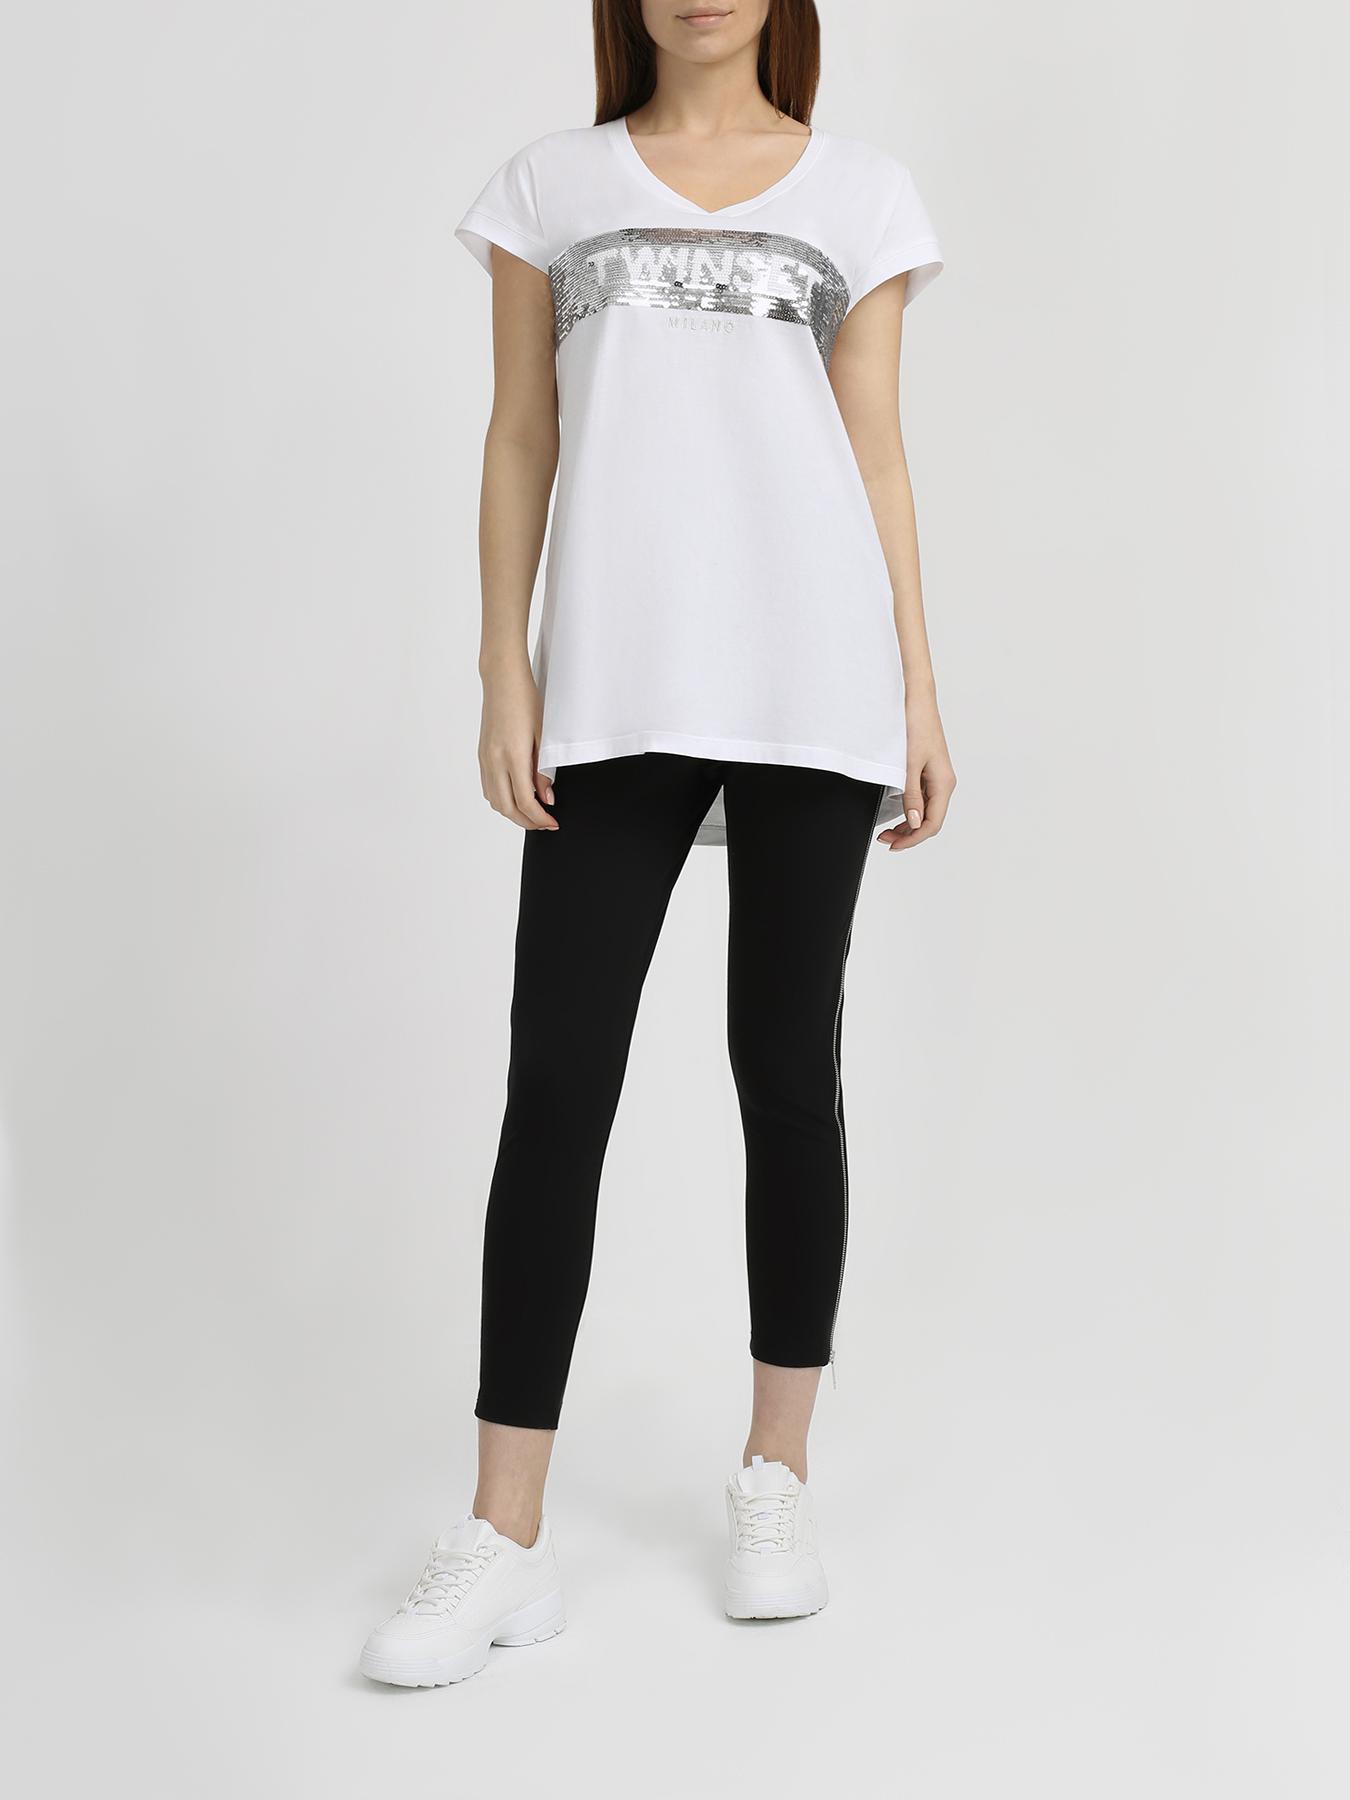 Фуфайка TWINSET MILANO Хлопковая футболка джинсы twinset milano twinset milano tw008ewbwph2